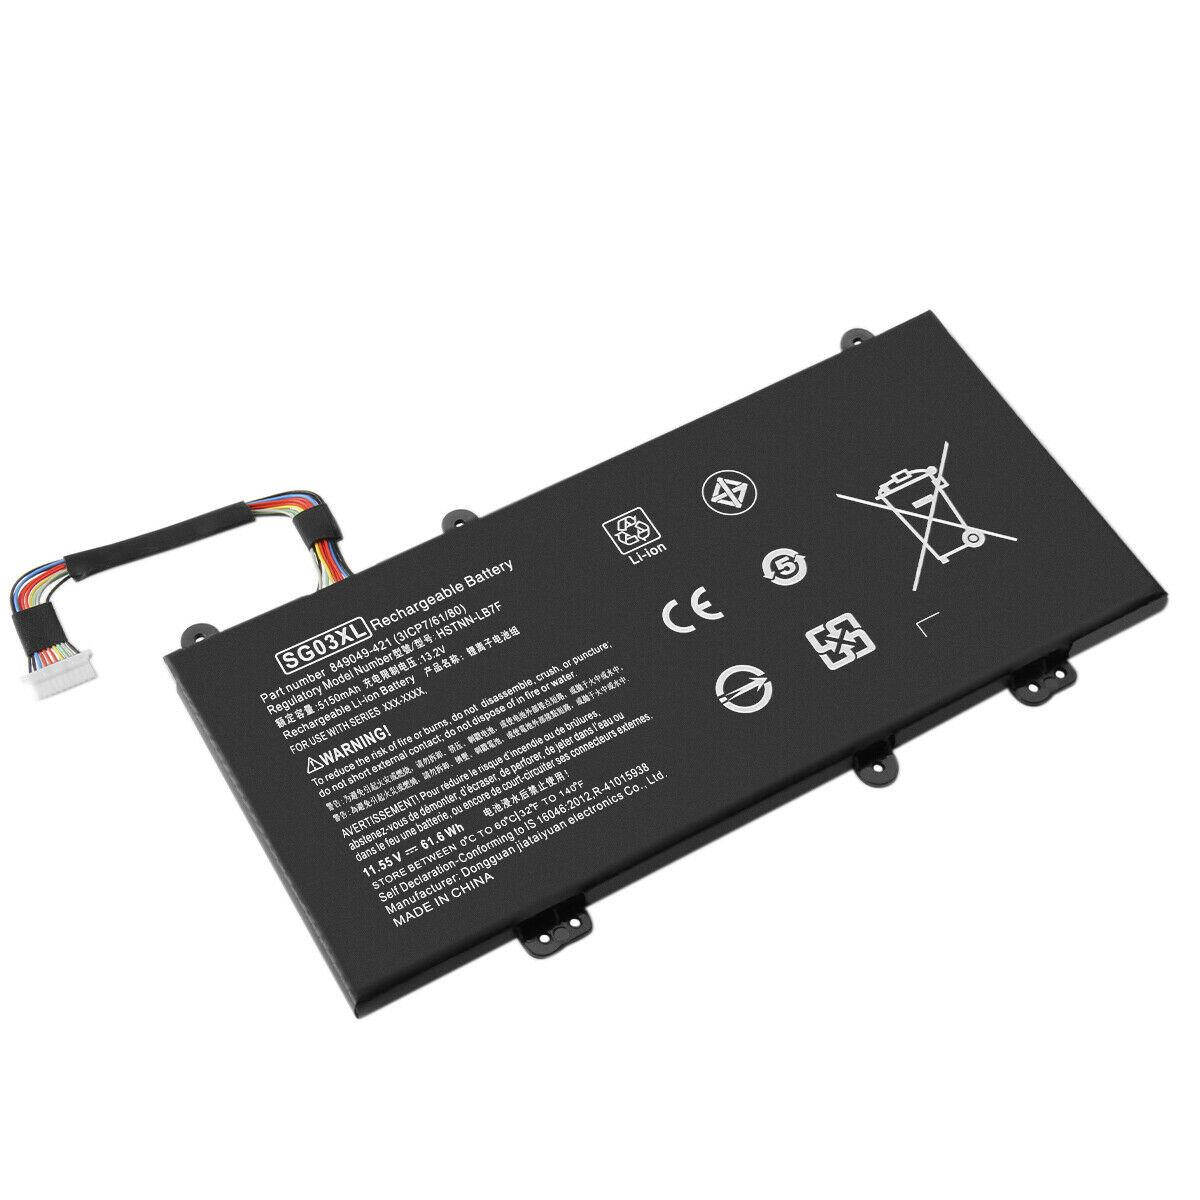 SG03XL HP Envy Notebook M7-U009DX 17-u163cl 849314-850 849315-850 kompatibelt batterier